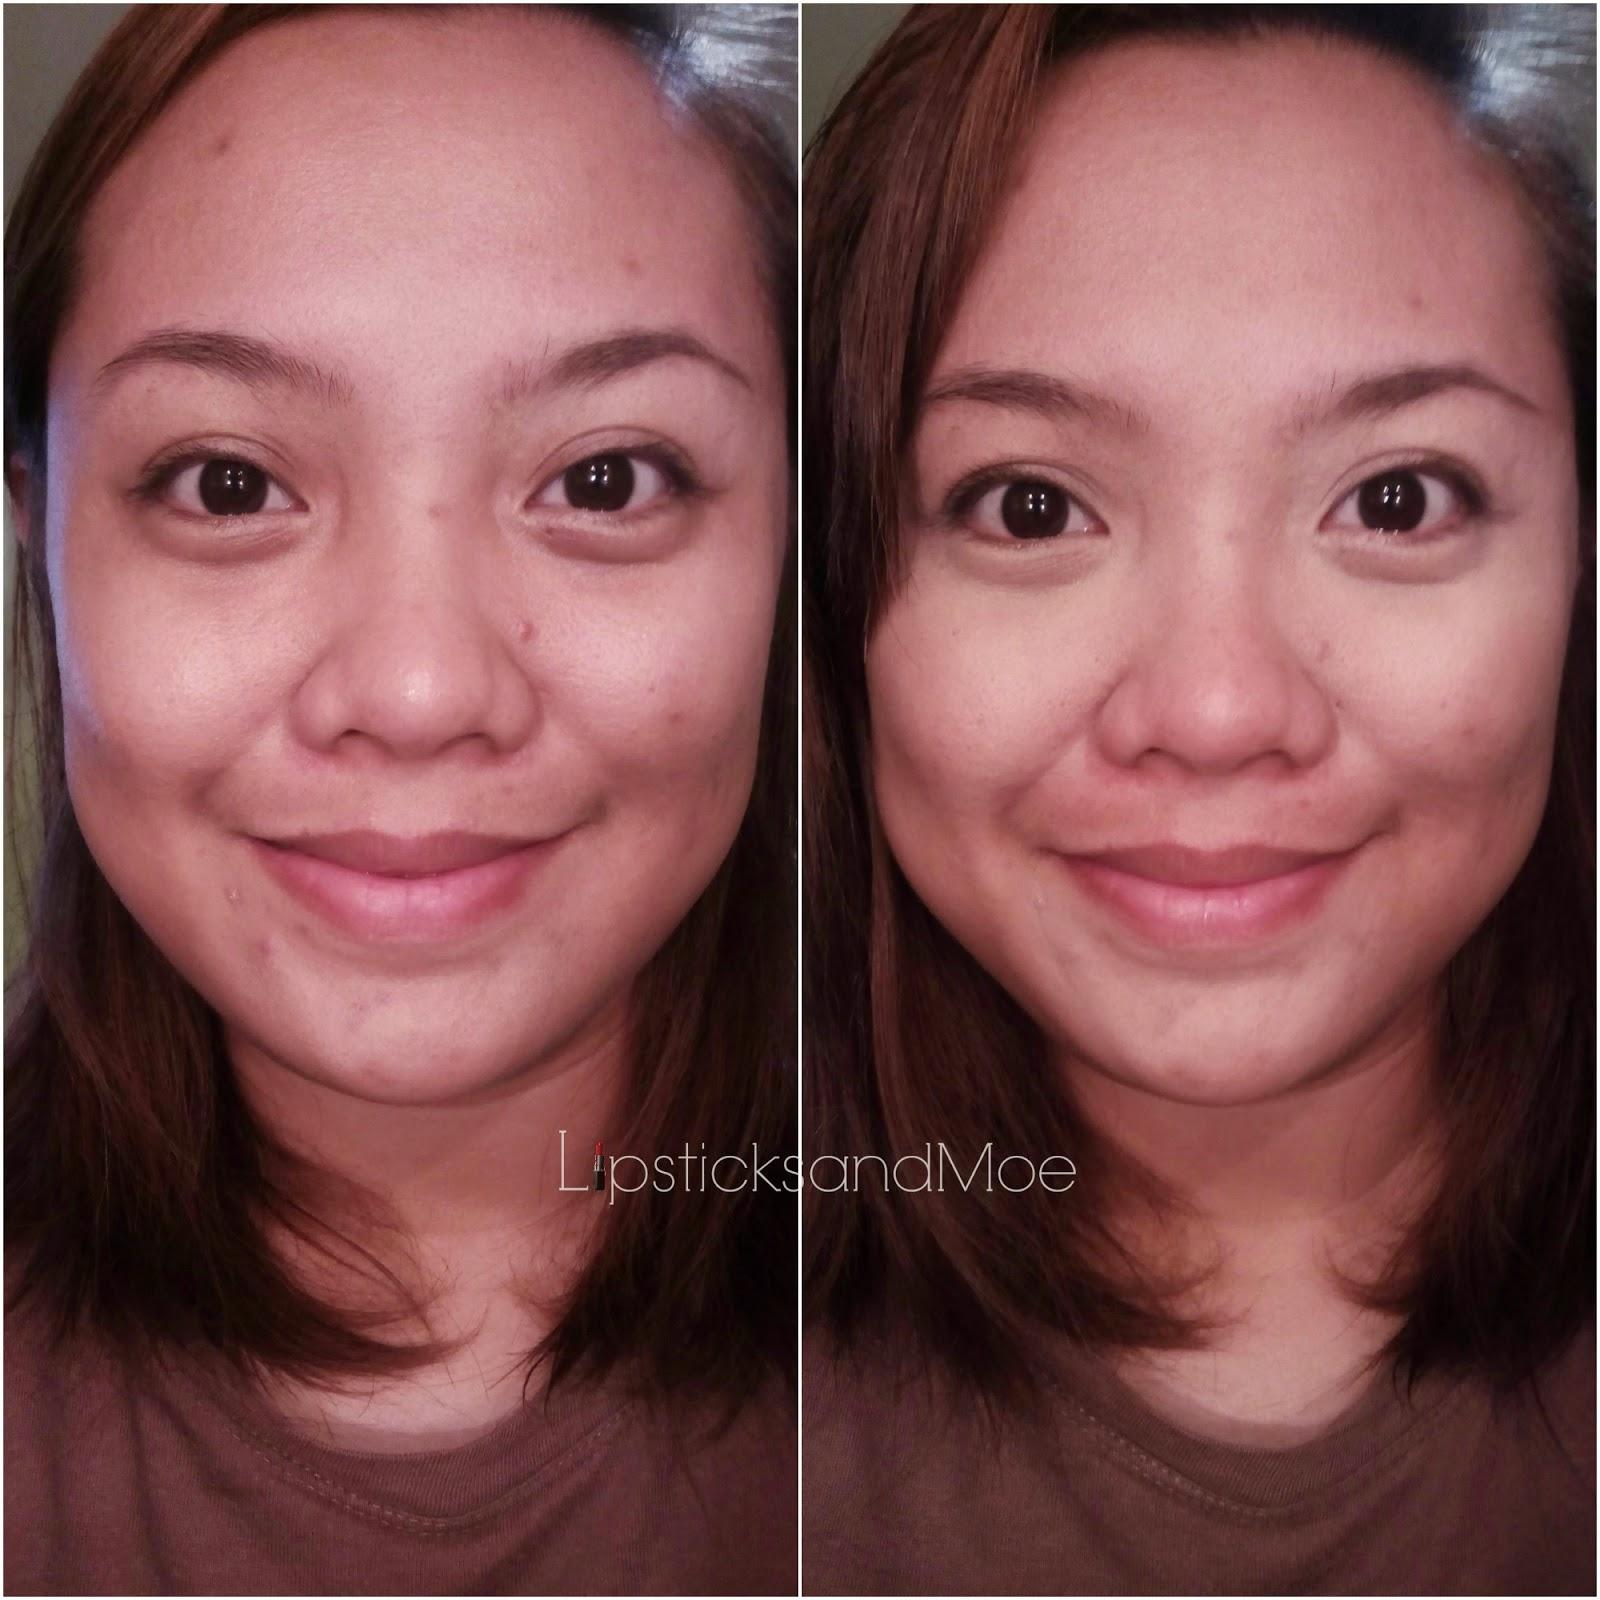 Lipsticks and Moe: Bobbie Cosmetics Poof! Concealer